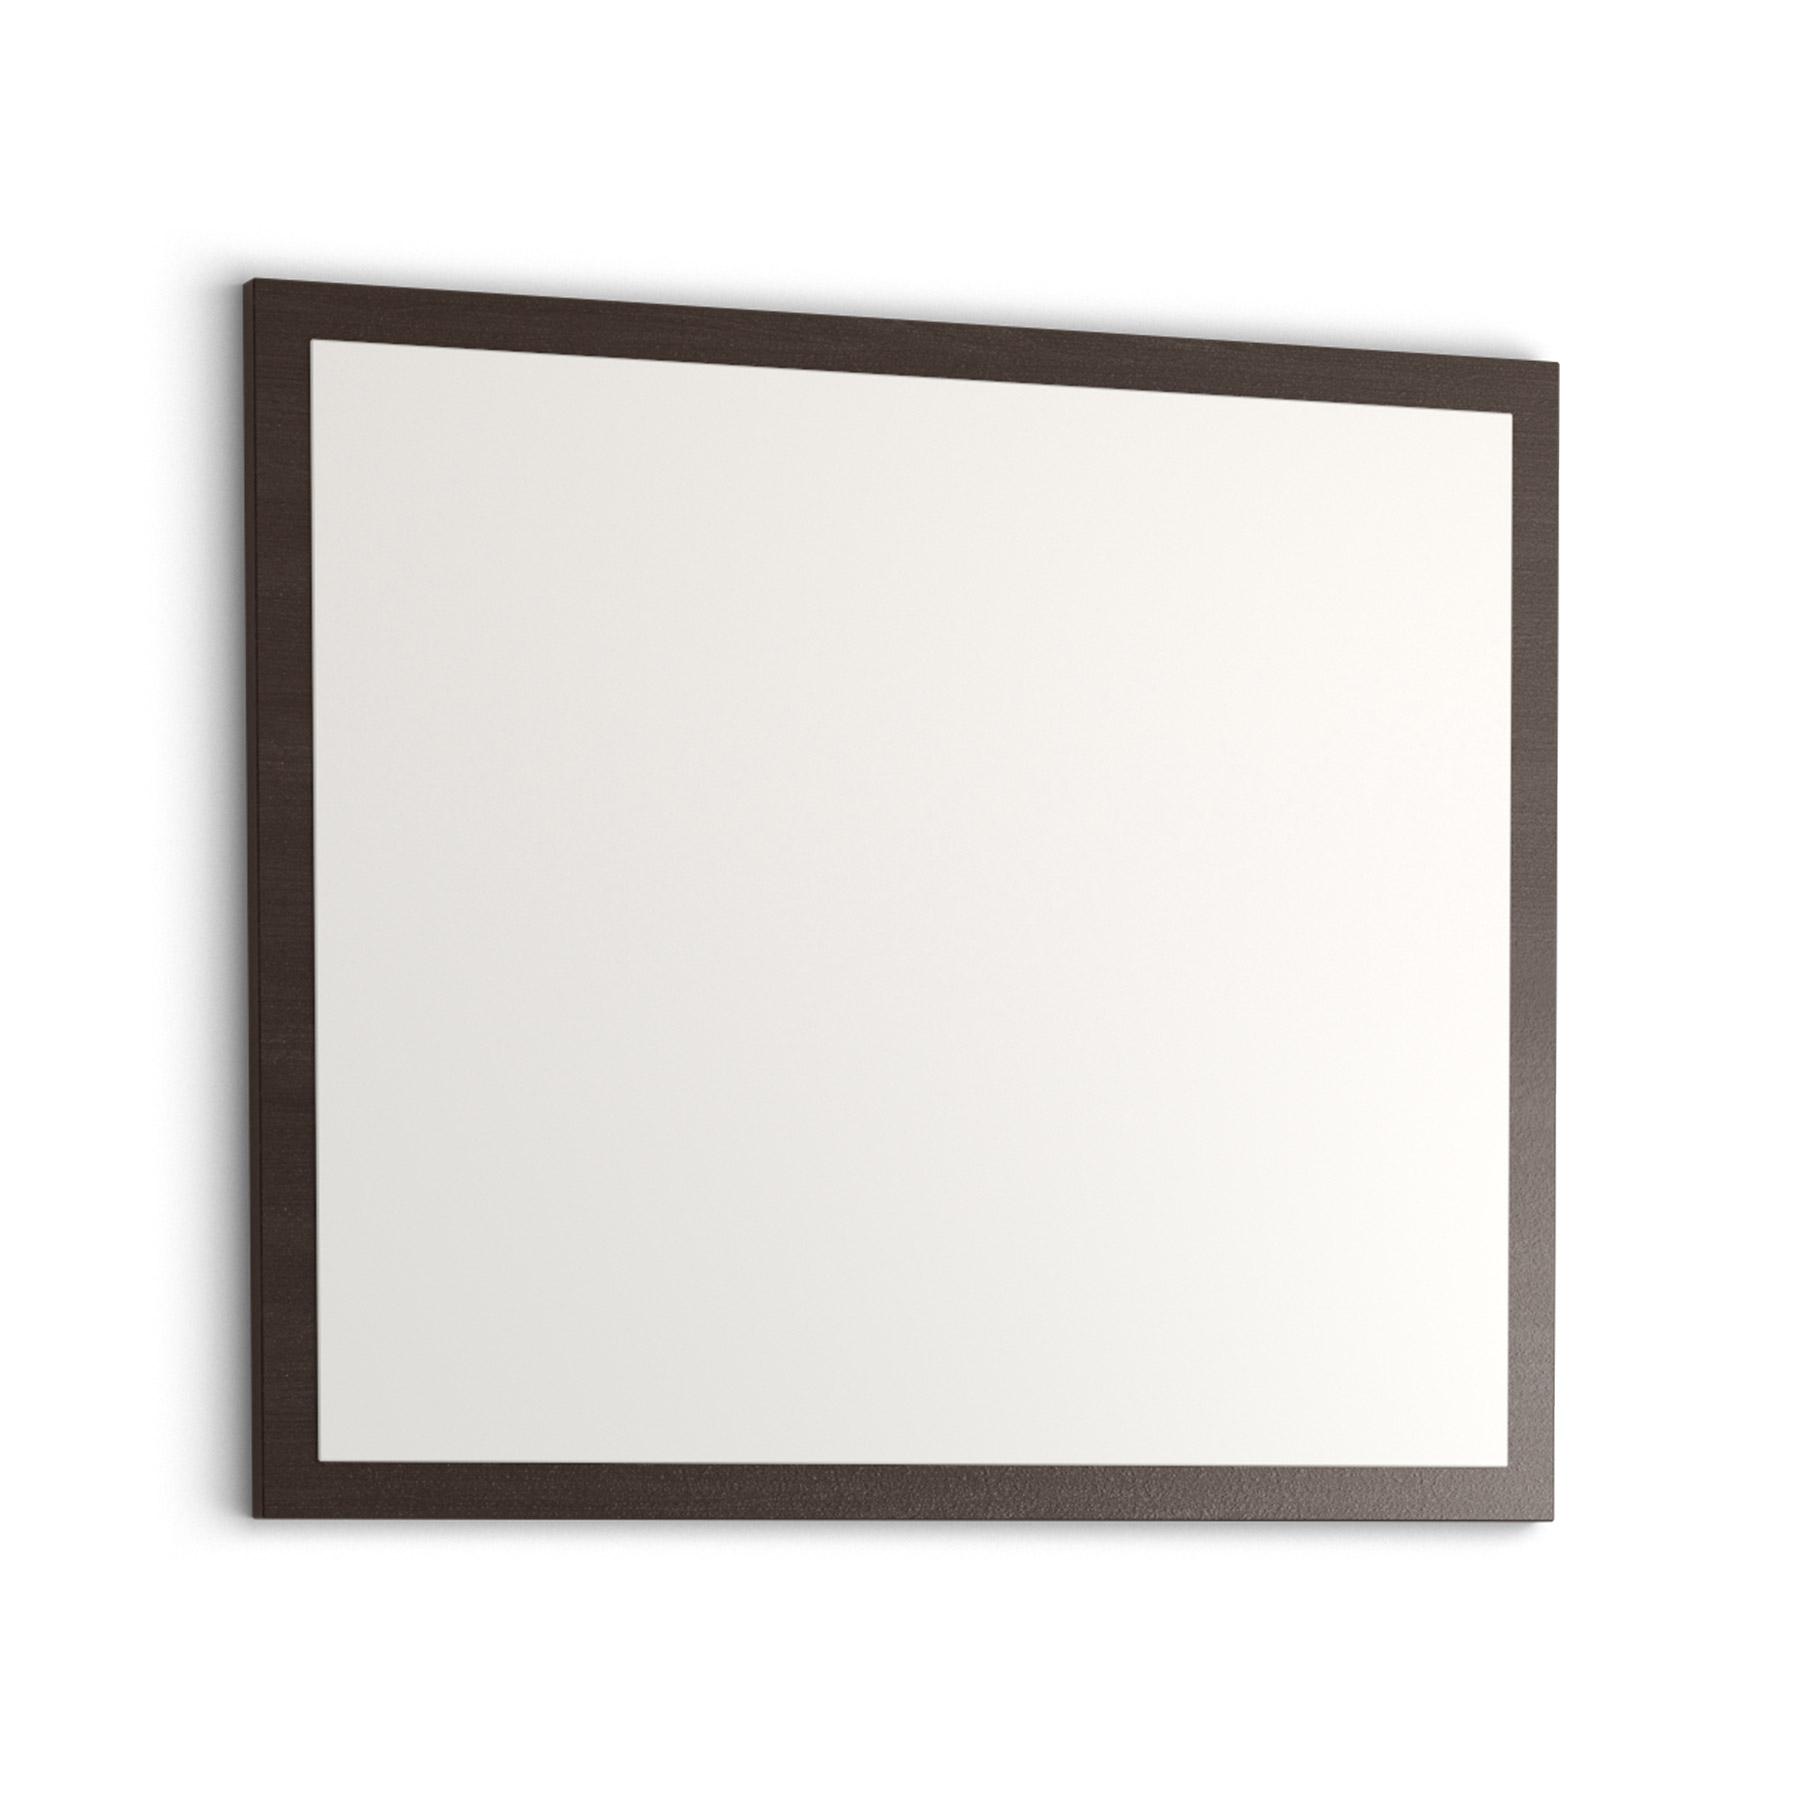 Spegel Vedum Sommen